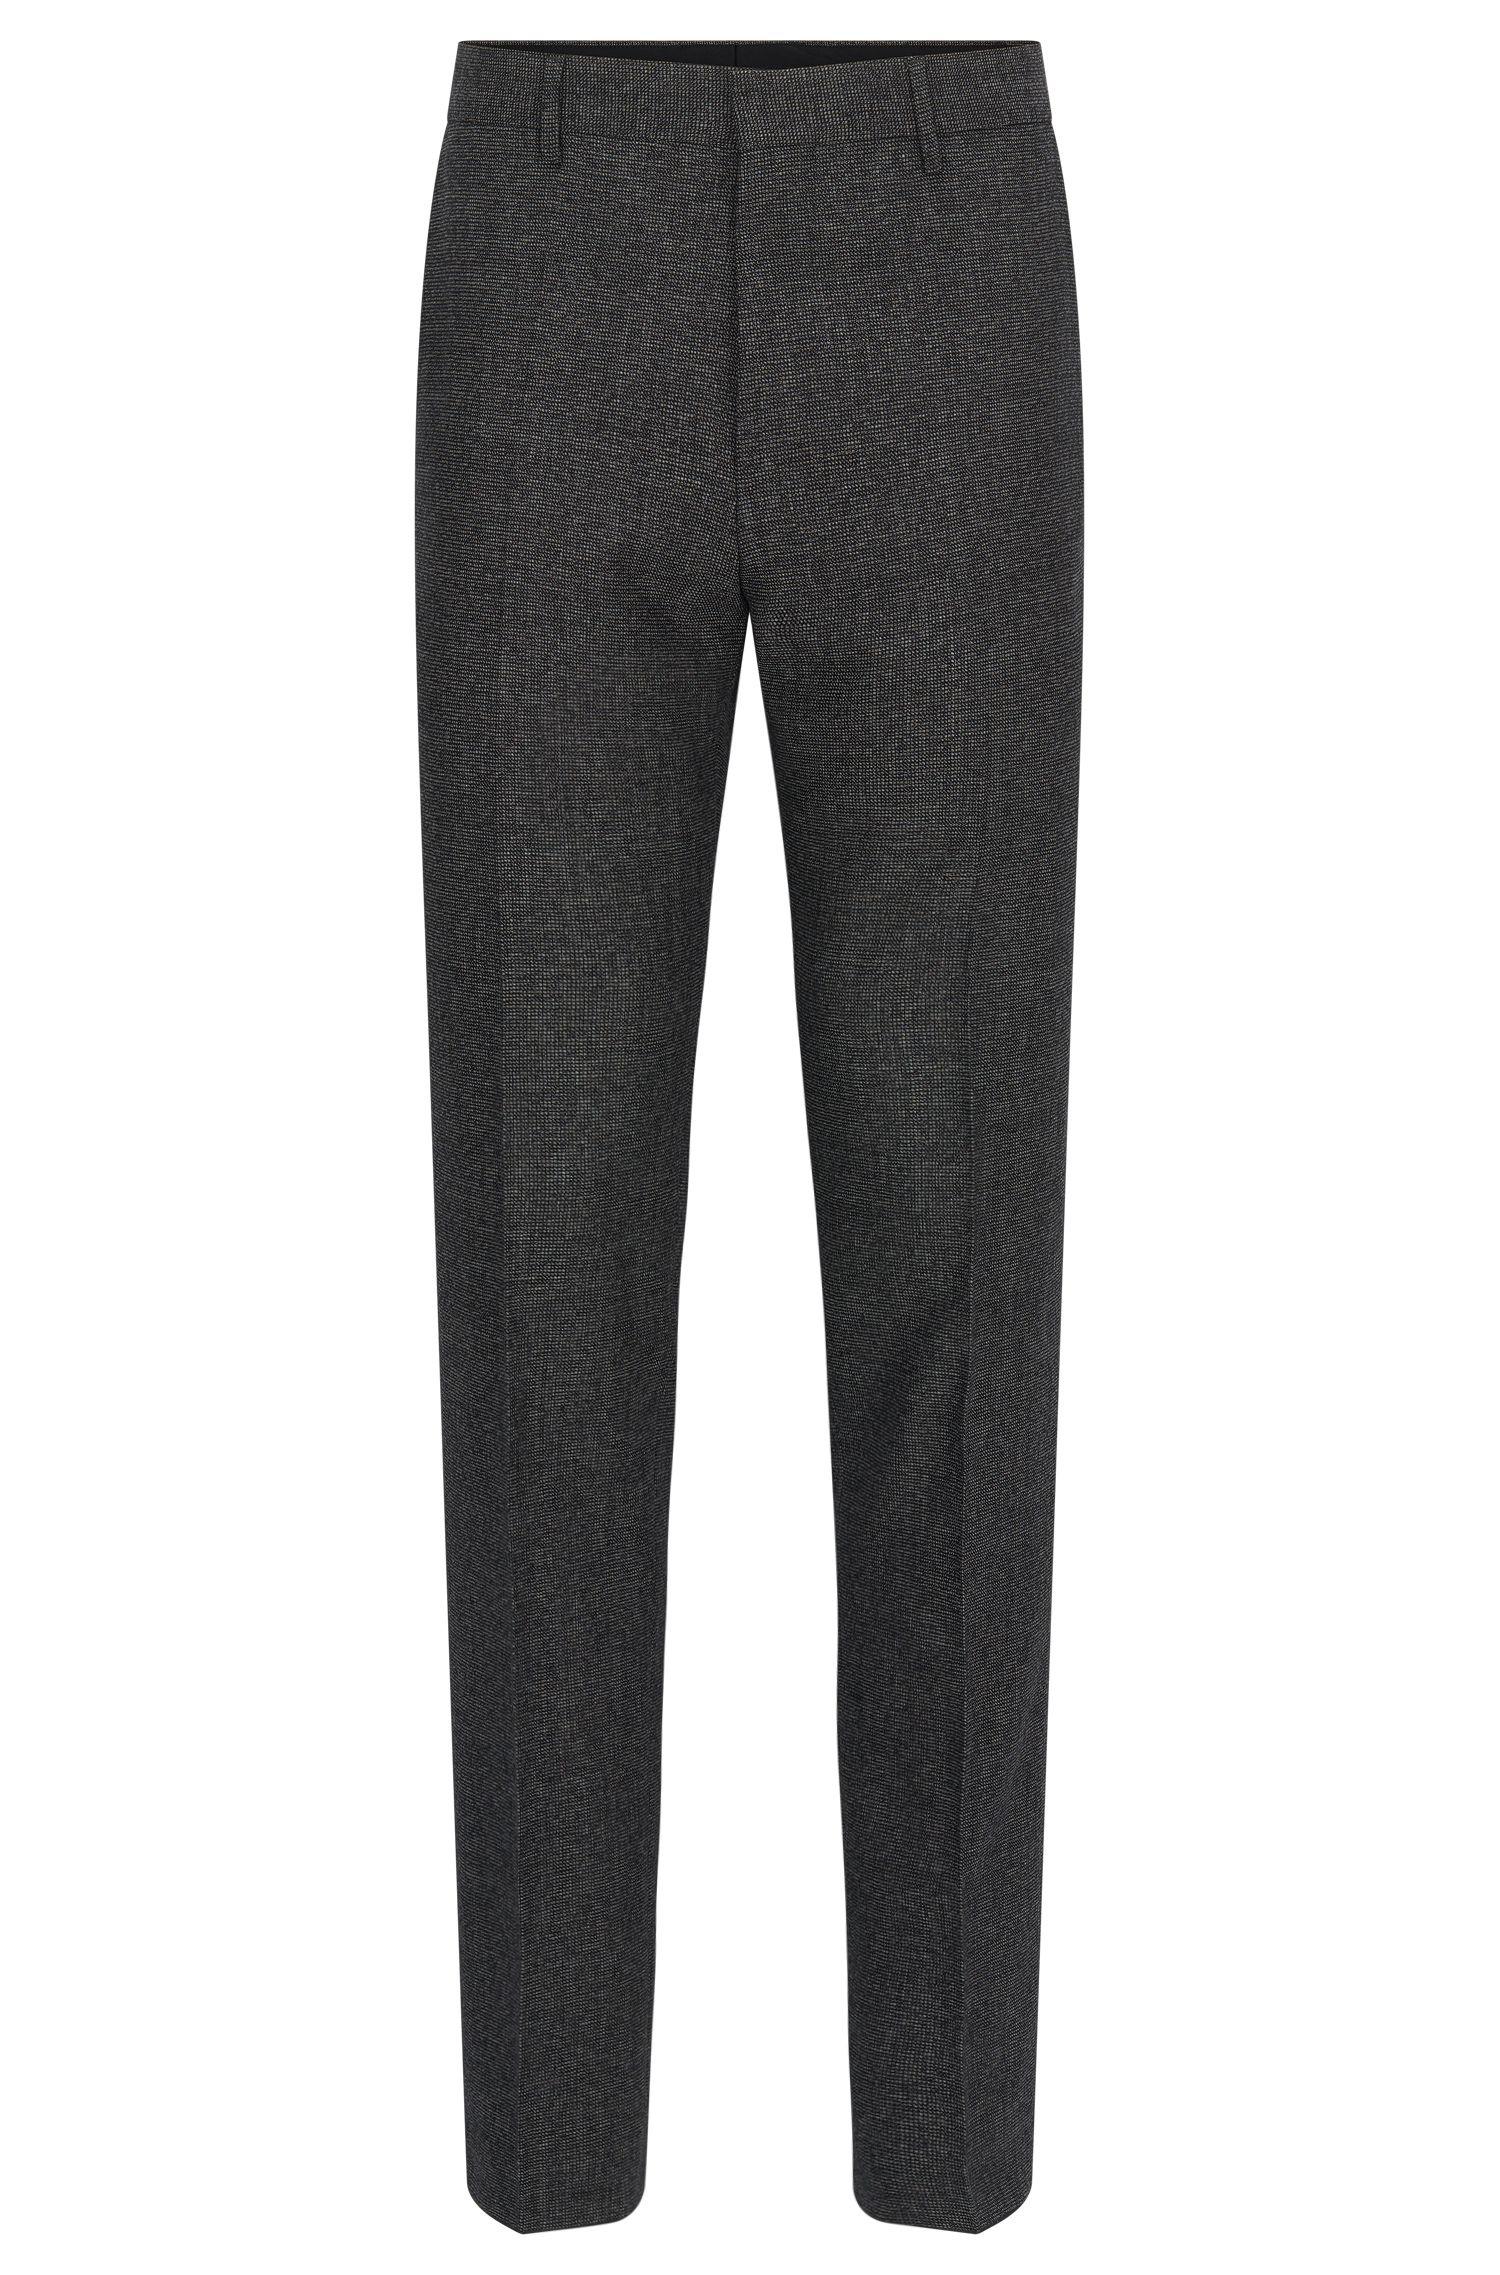 Nailhead Wool Cotton Dress Pants, Slim Fit | Giro